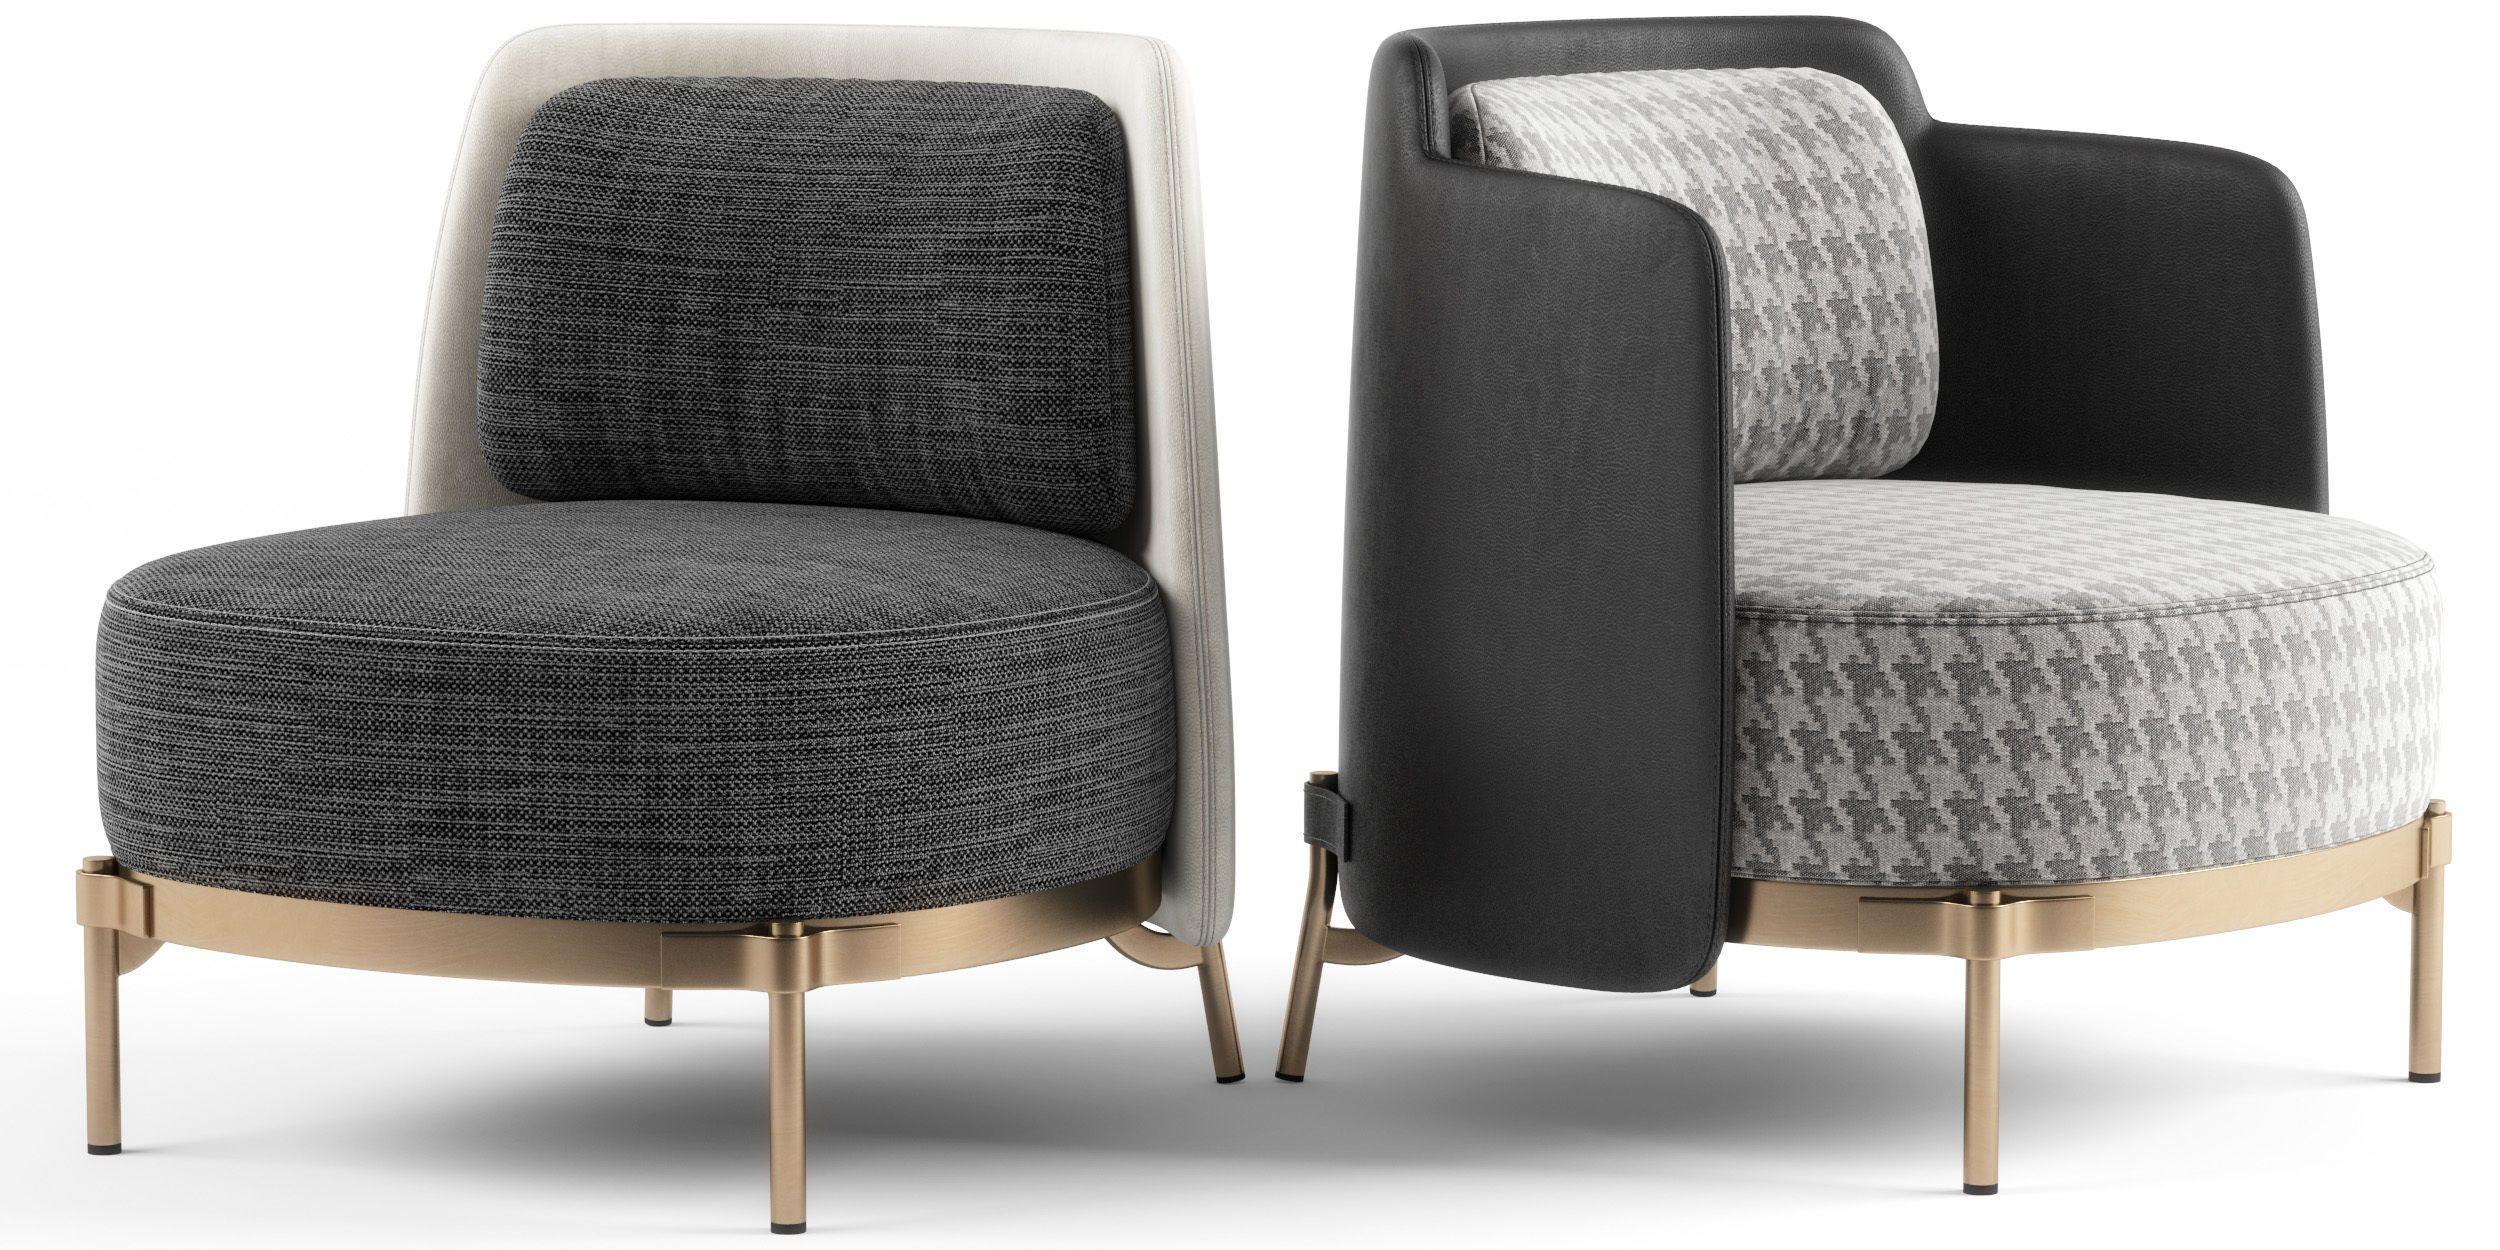 Minotti Tape Armchairs Work Hotels Furniture In 2019 Minotti